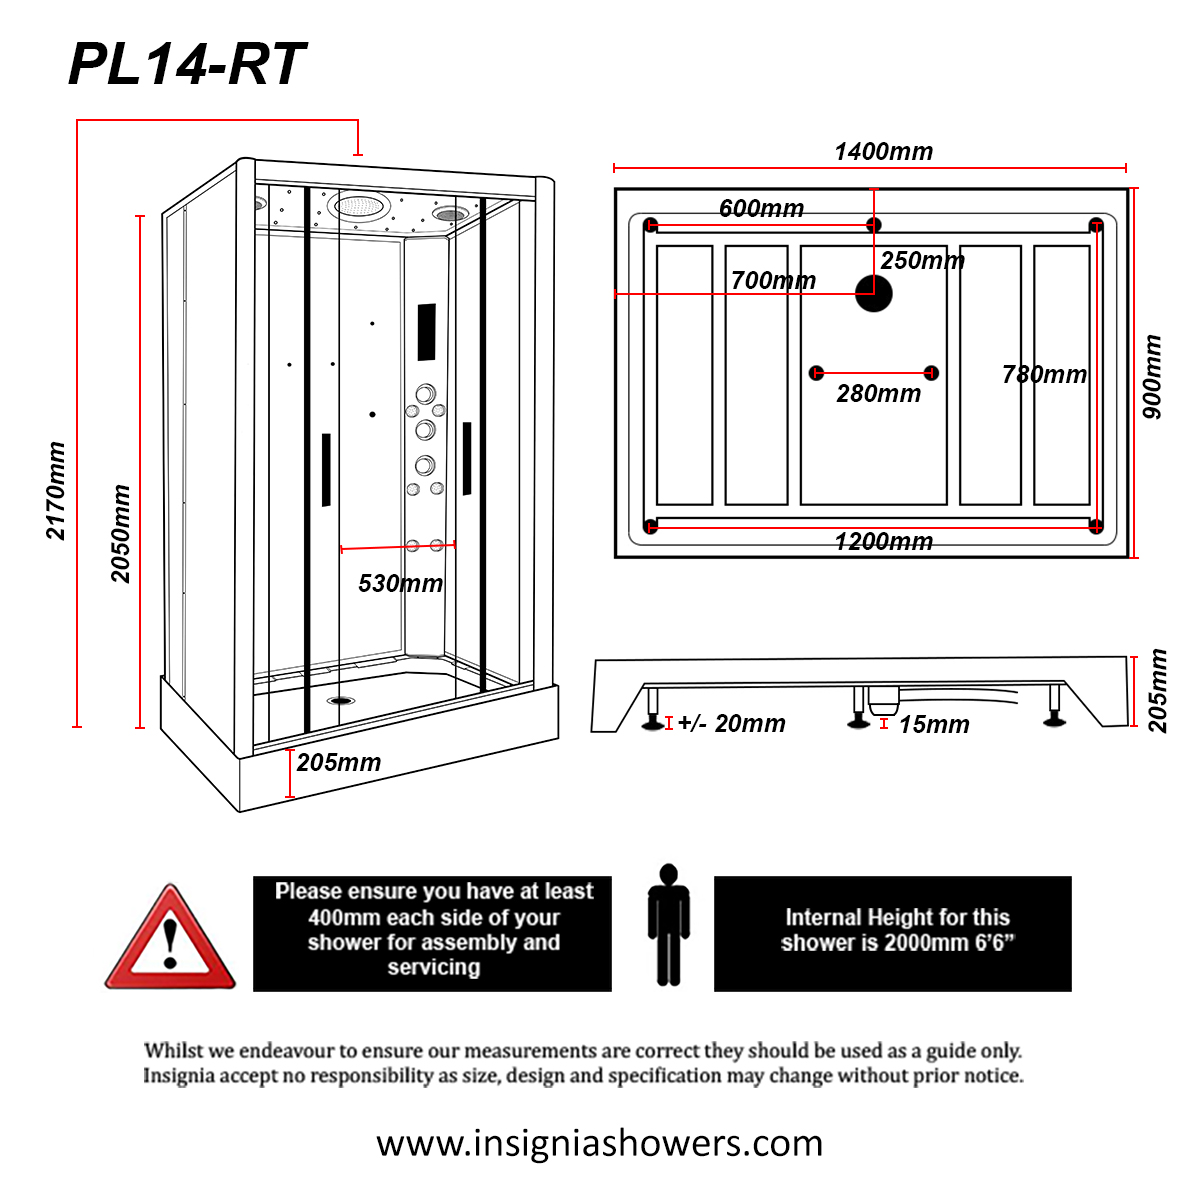 PL14-RT